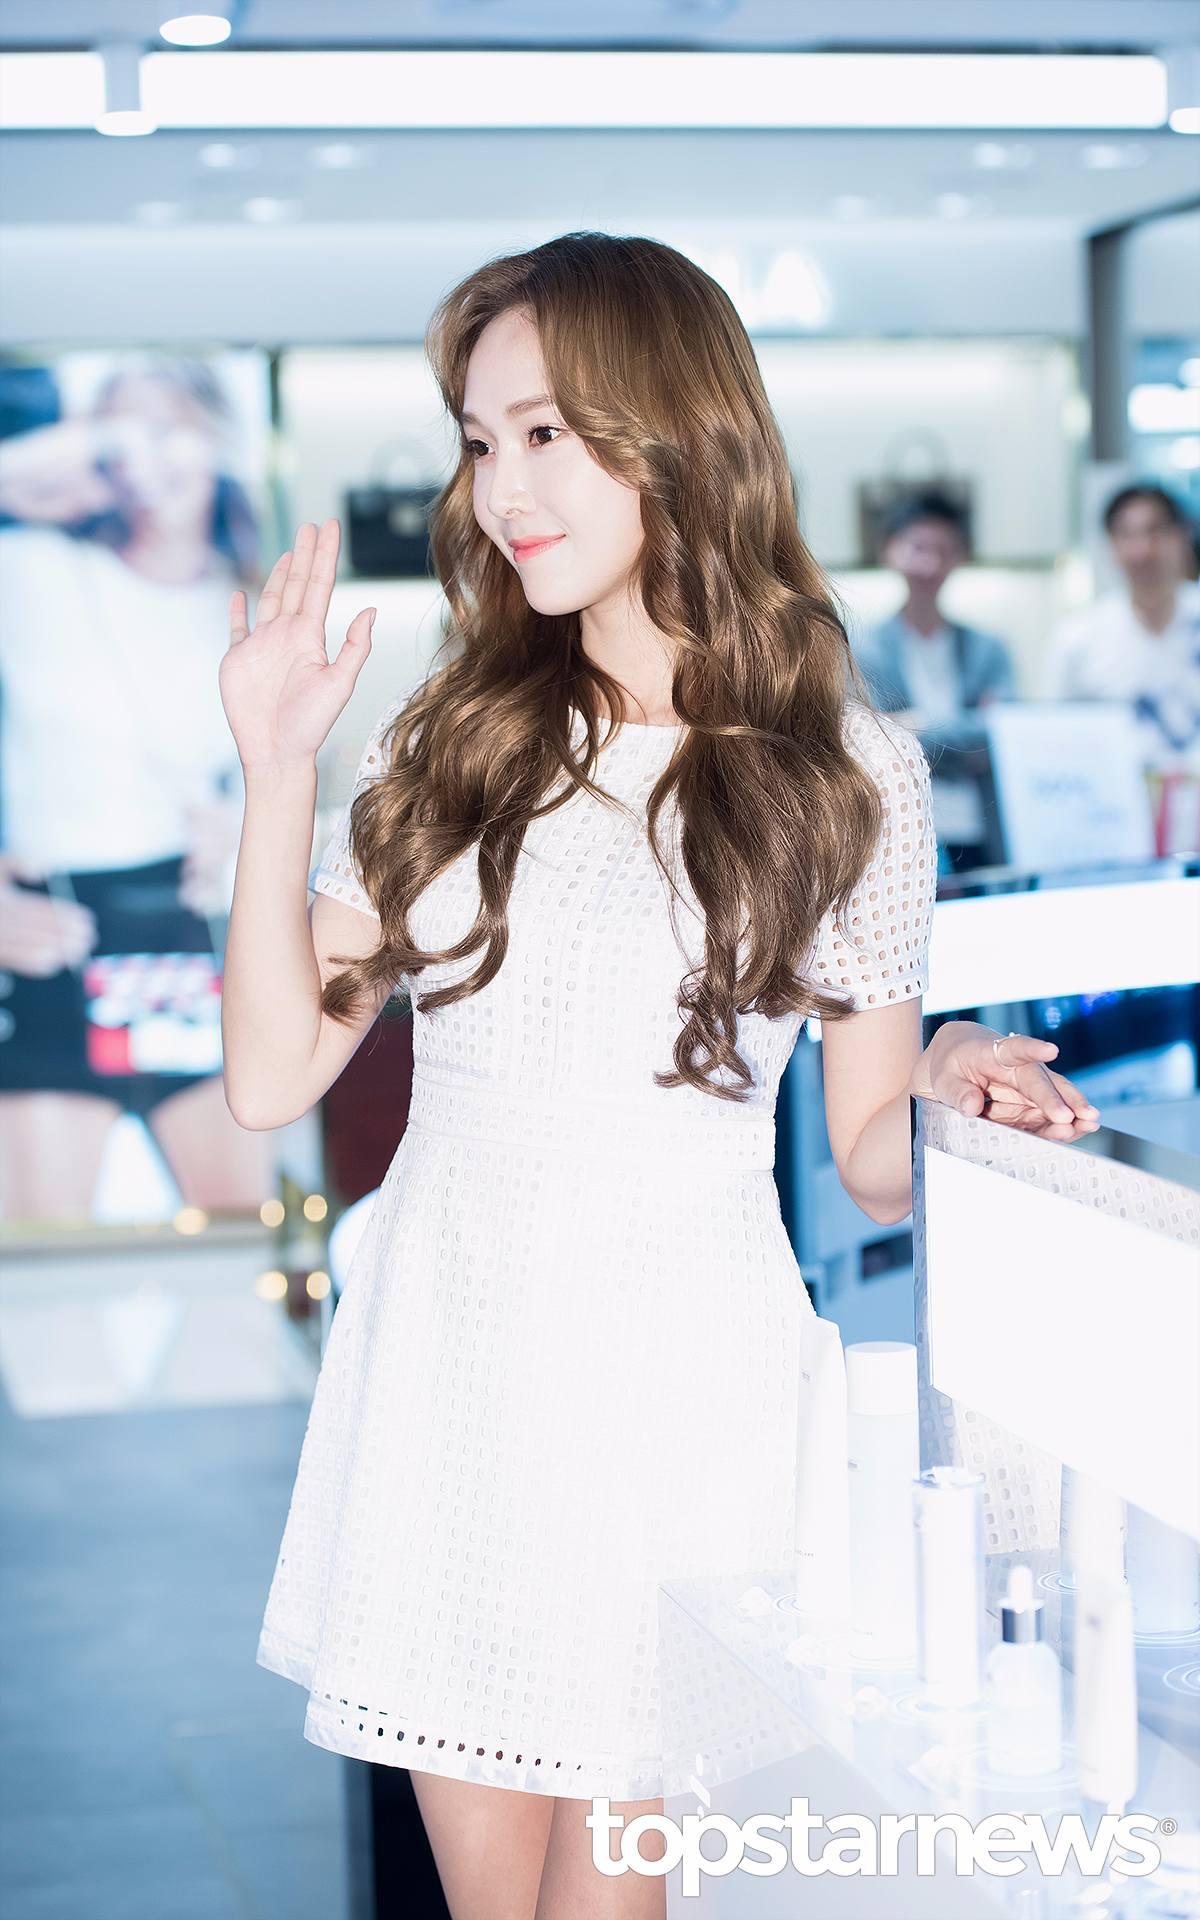 7位 Jessica 關注:24.3萬